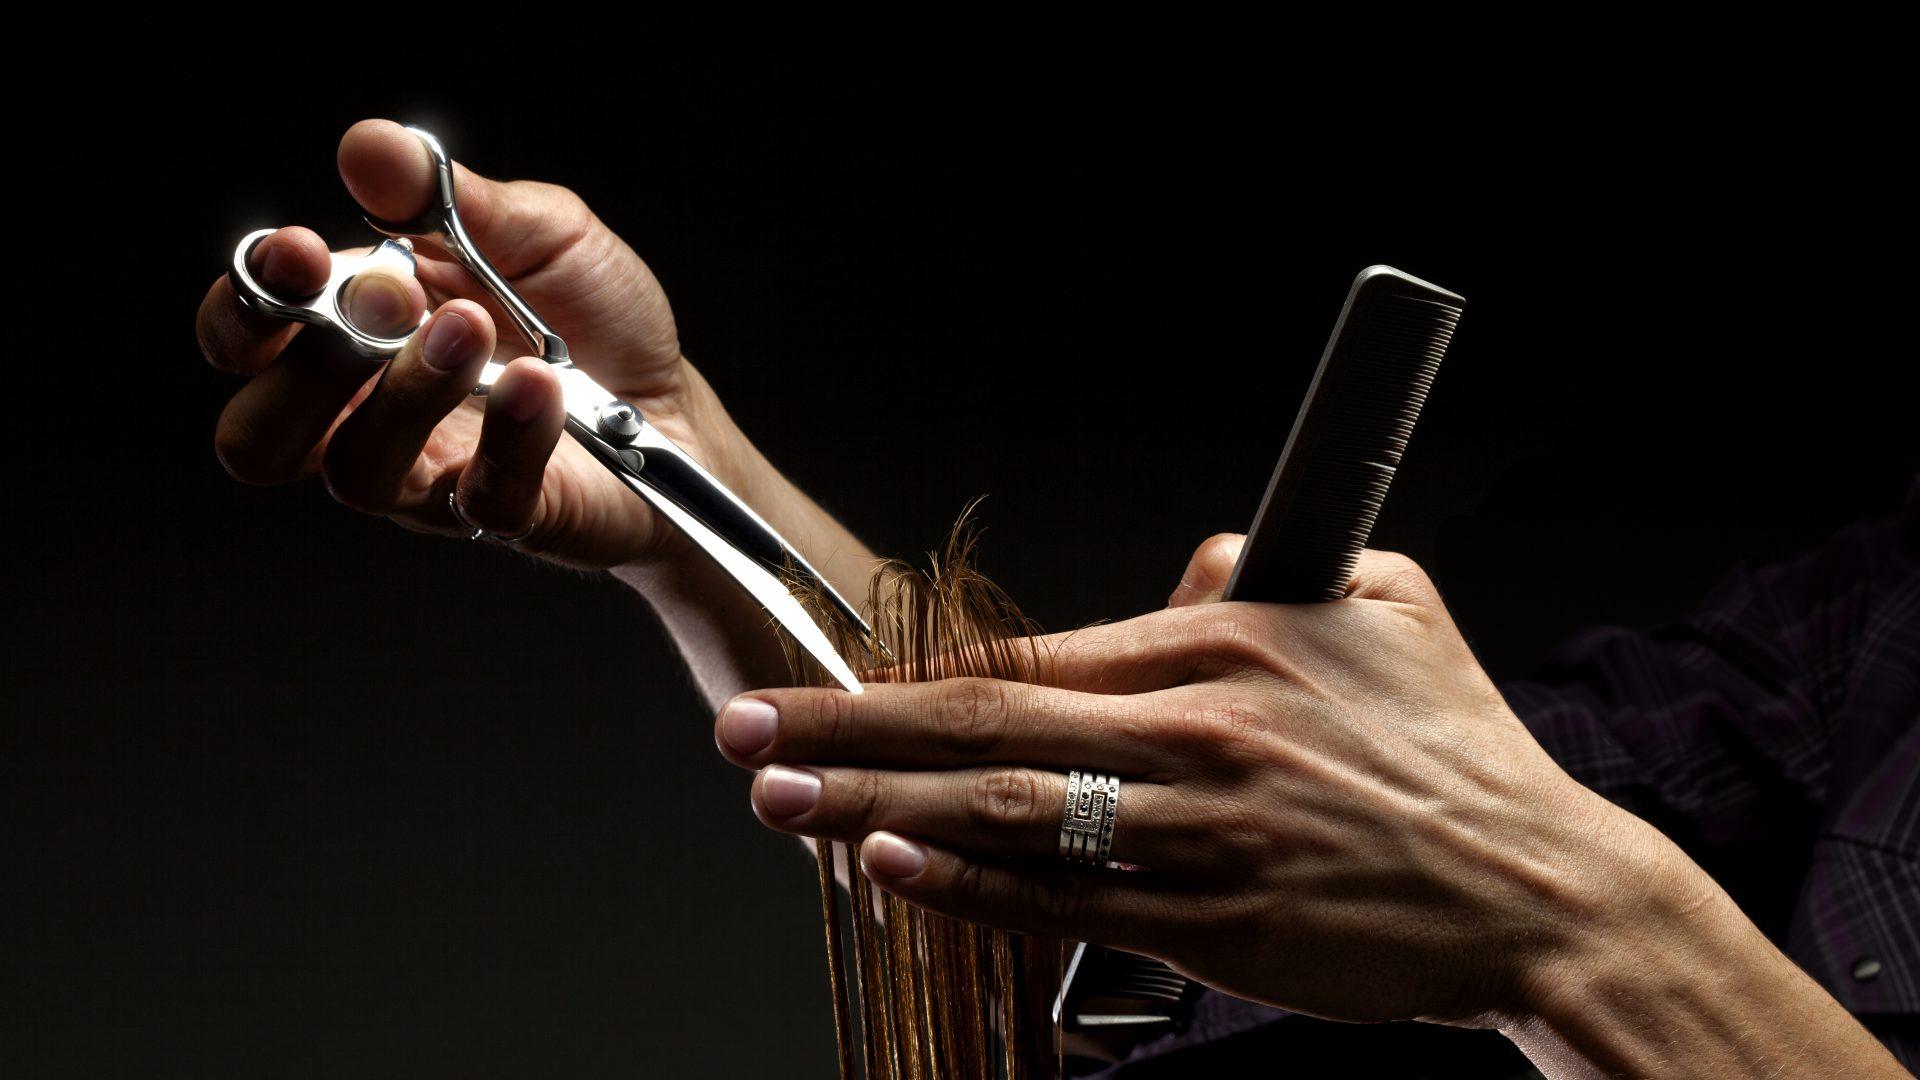 Friseure die zuhören in Wien